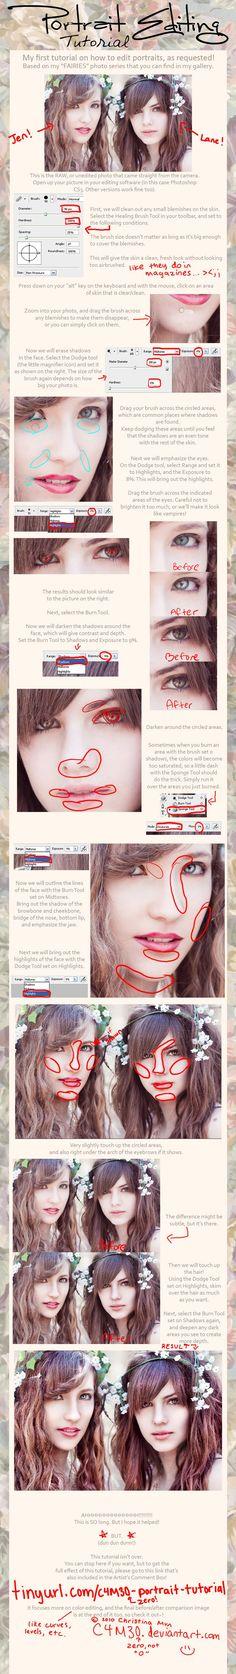 .:Portrait Editing TUTORIAL:. by C4M30.deviantart.com on @deviantART